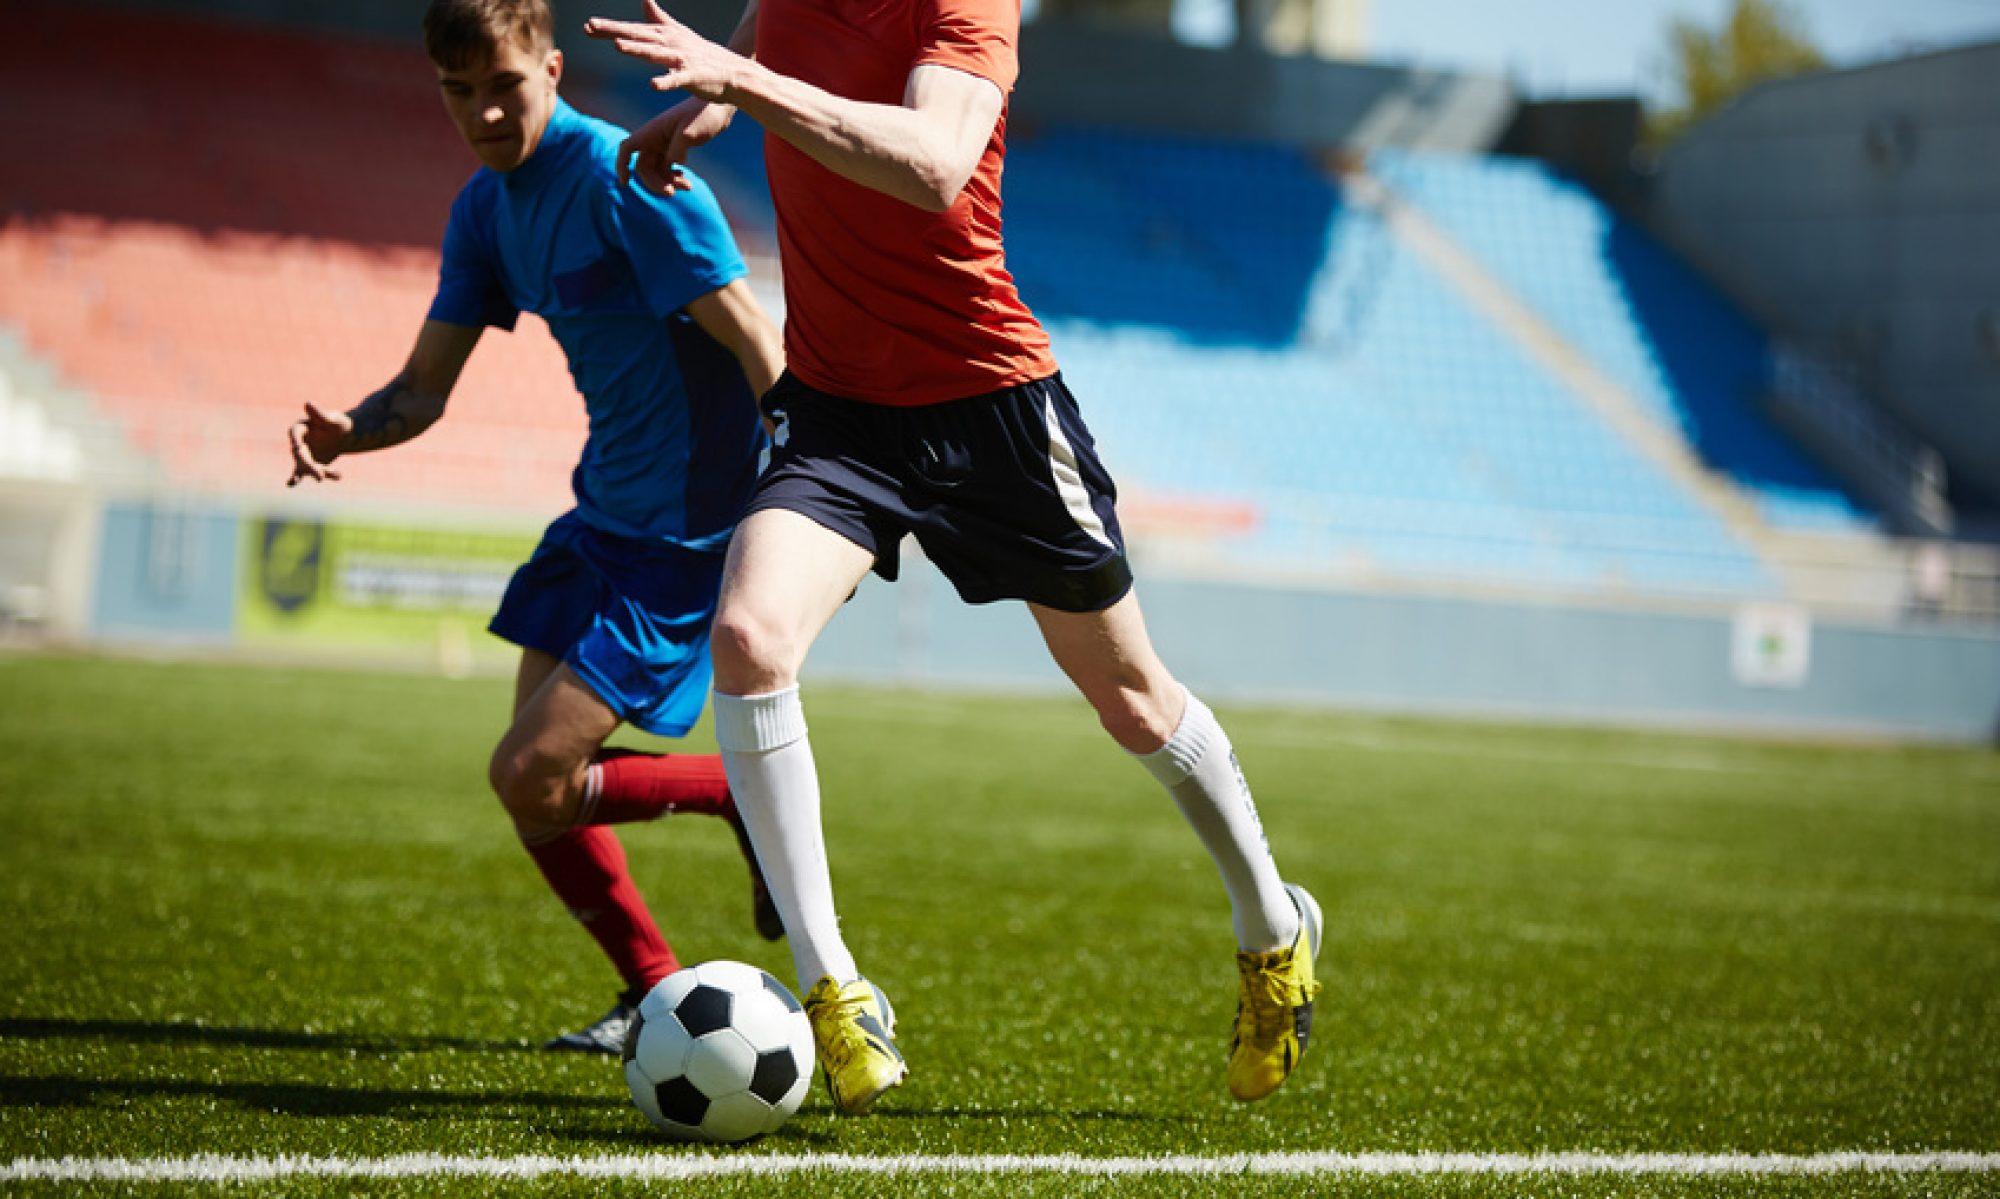 Nordfyns Firma Idræt Fodbold